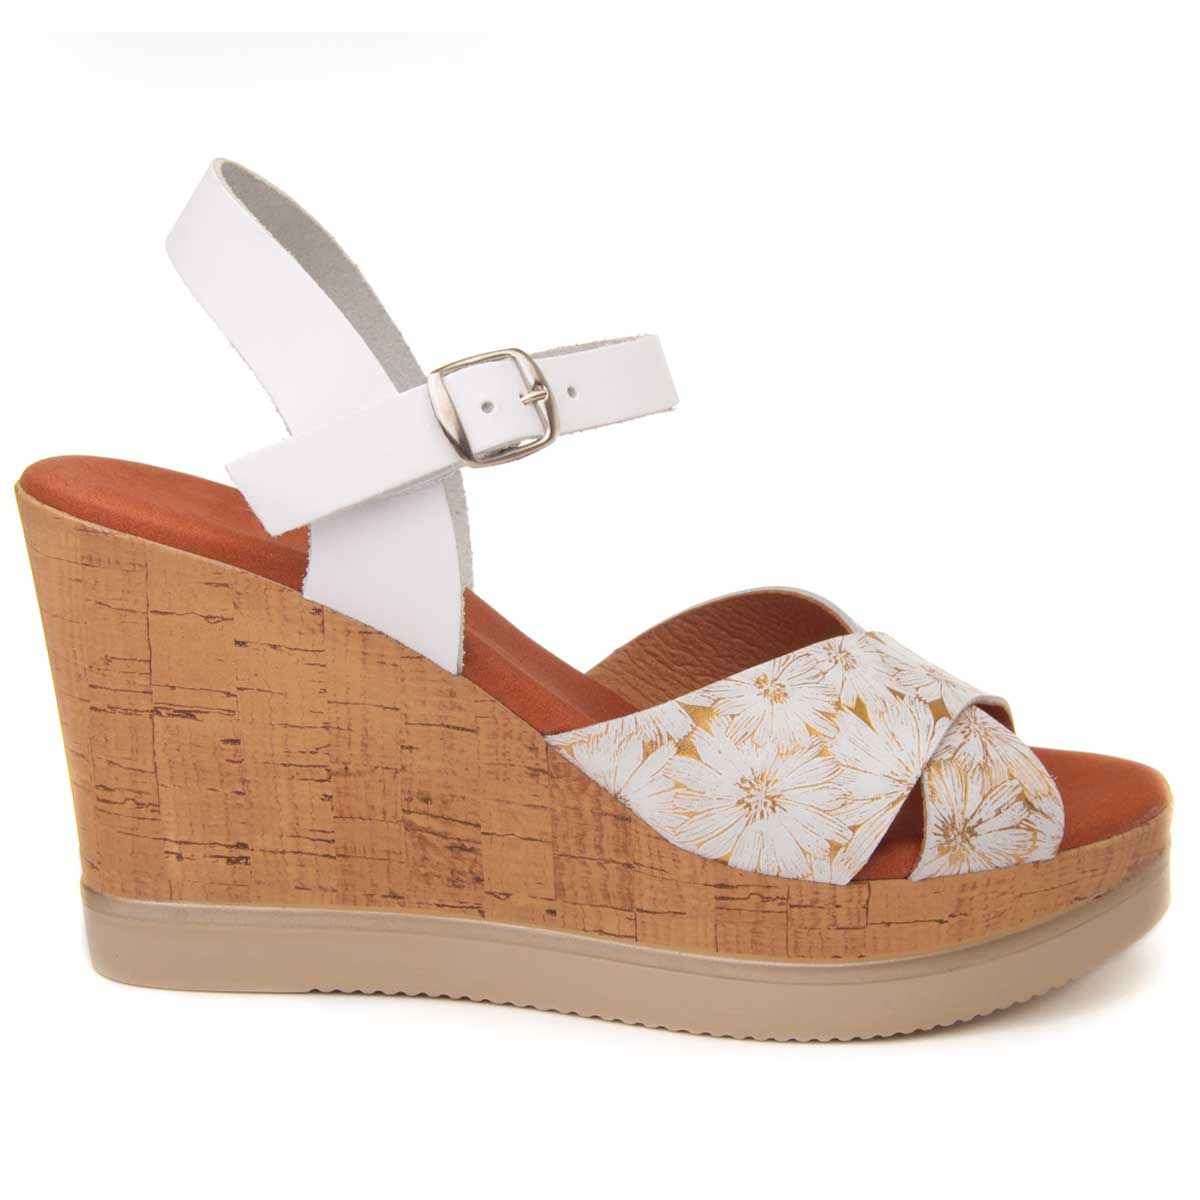 Purapiel Platform Sandal in Gold